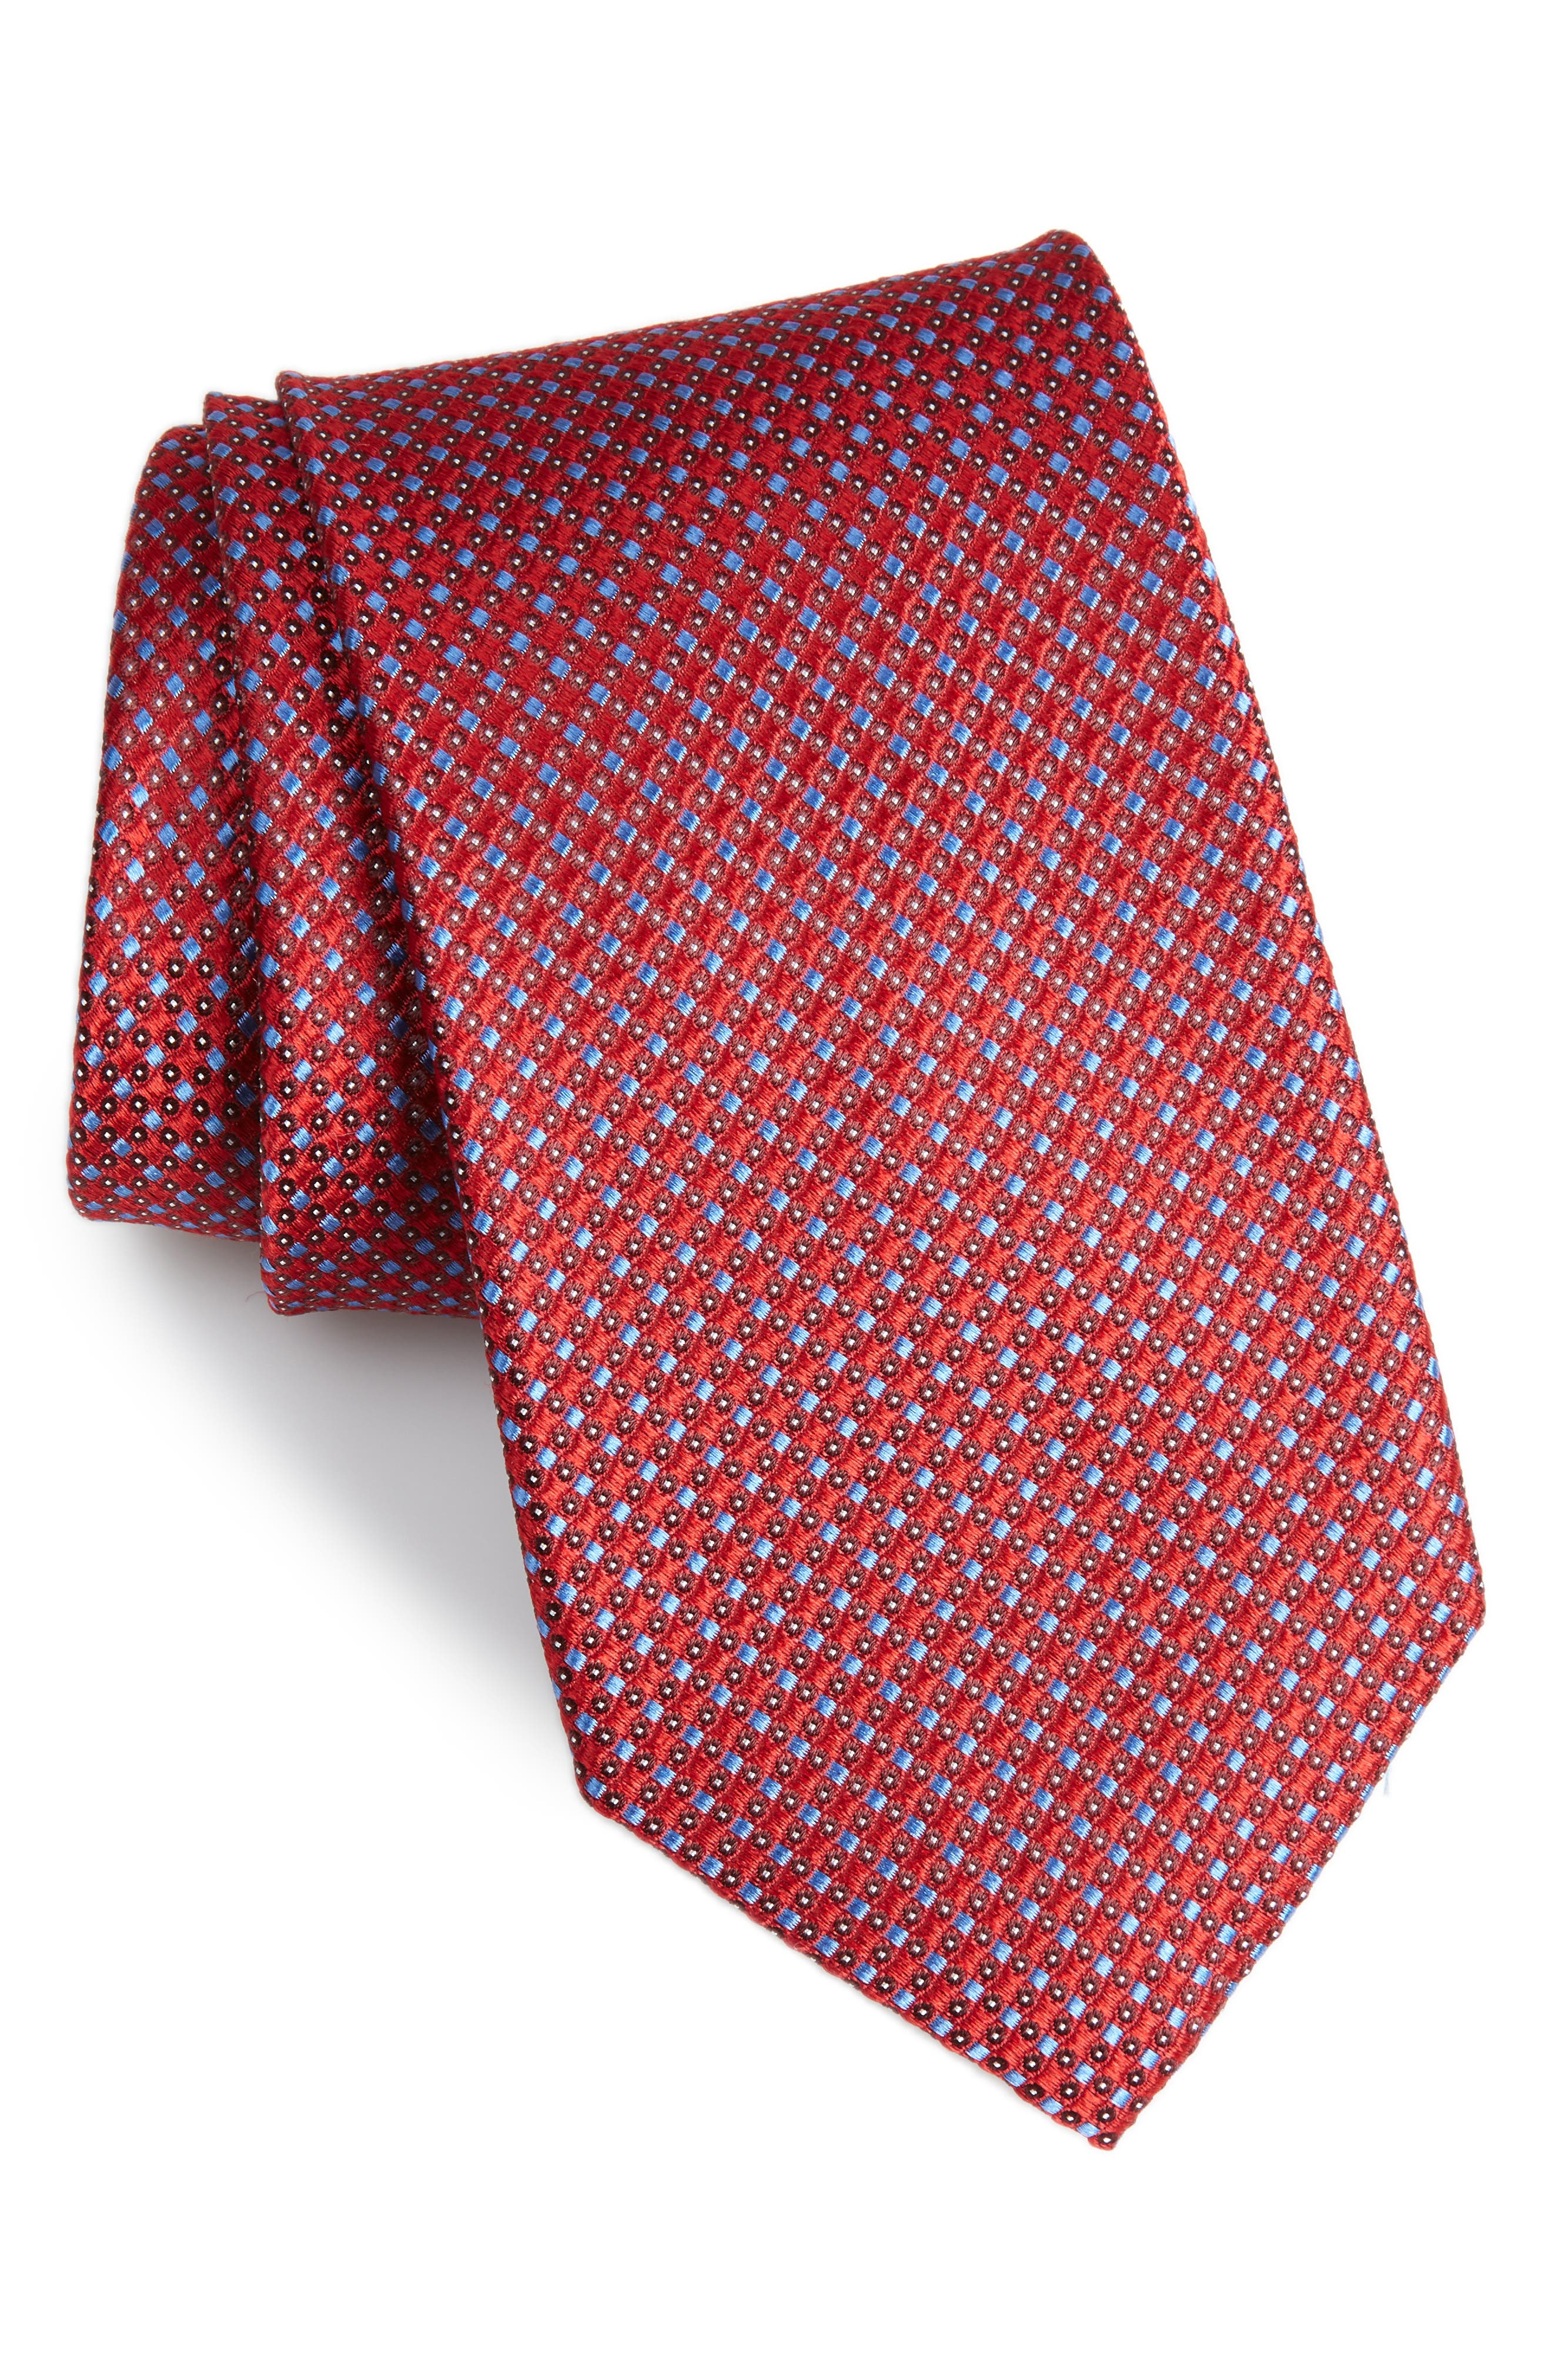 NORDSTROM MEN'S SHOP Bagni Check Silk Tie, Main, color, RED